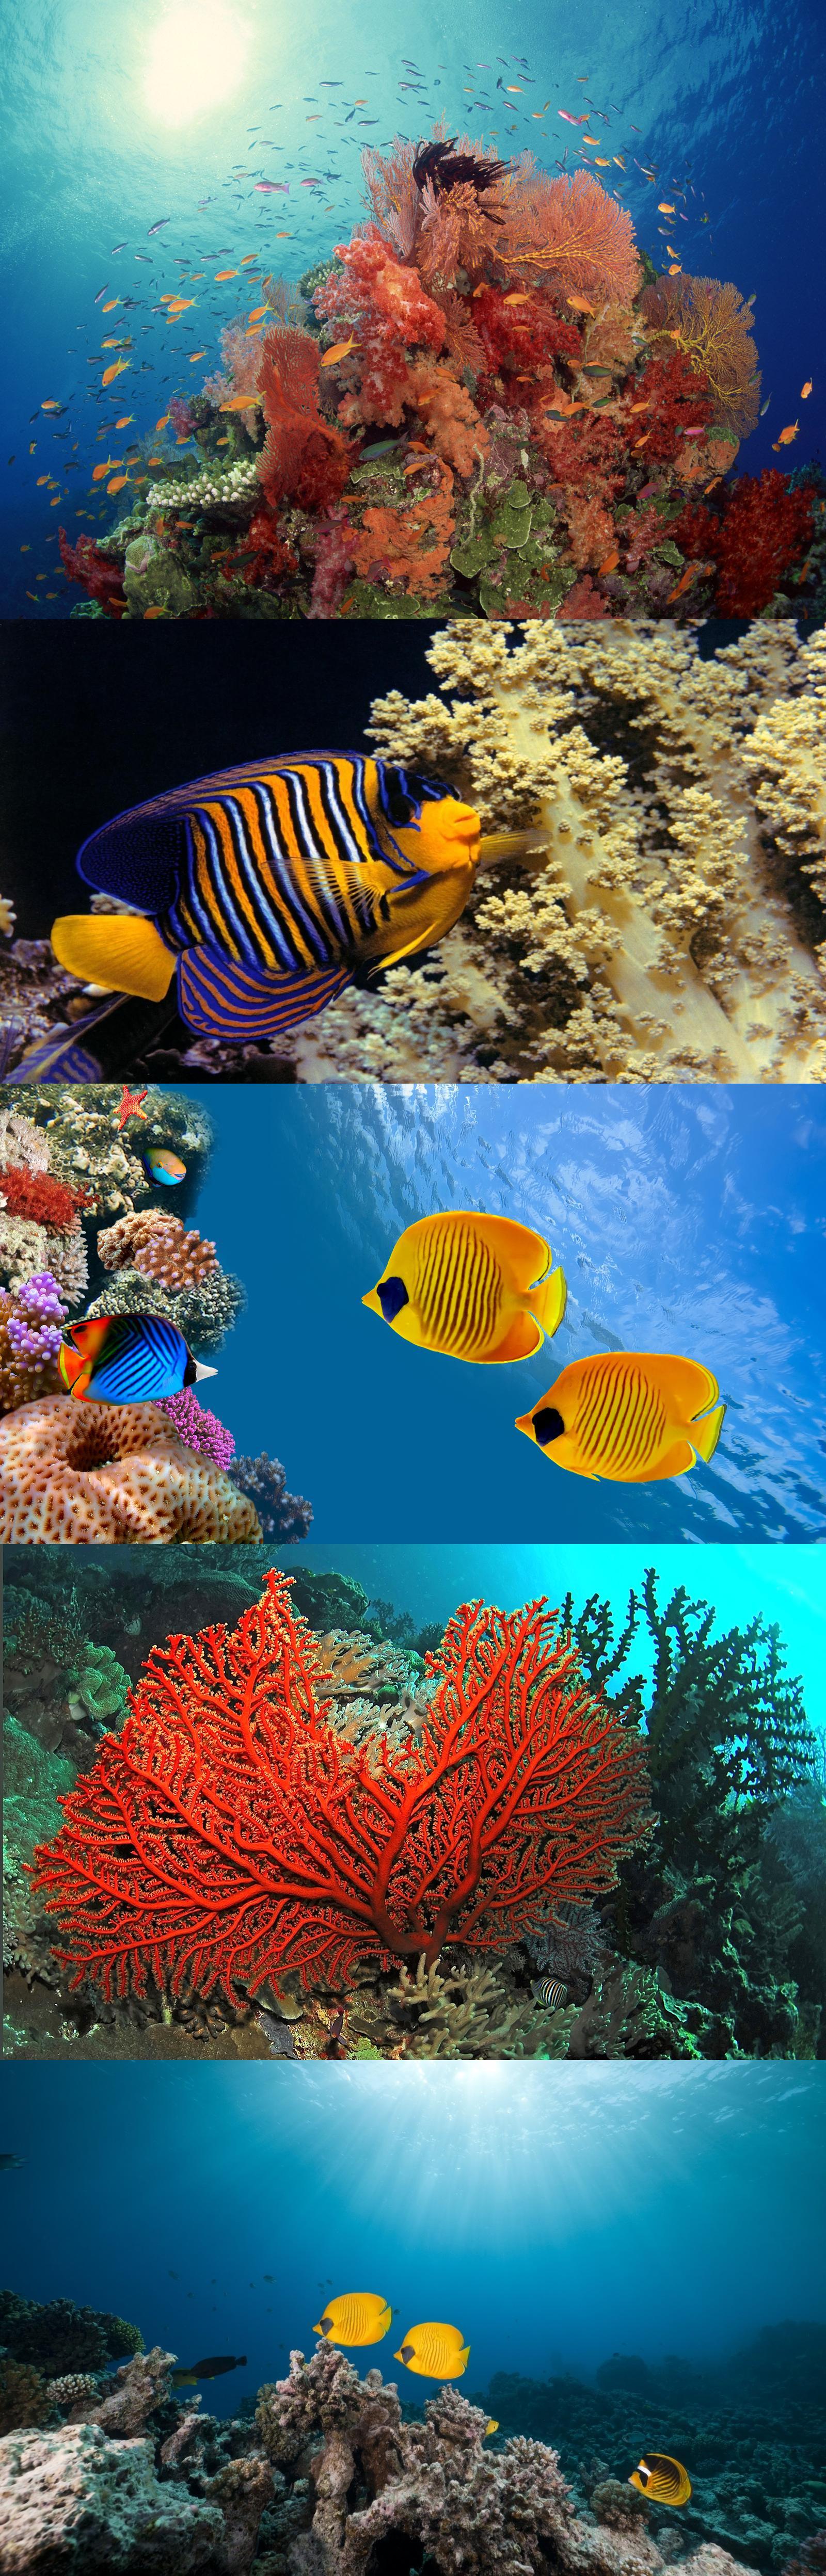 Ocean Corals and Fish